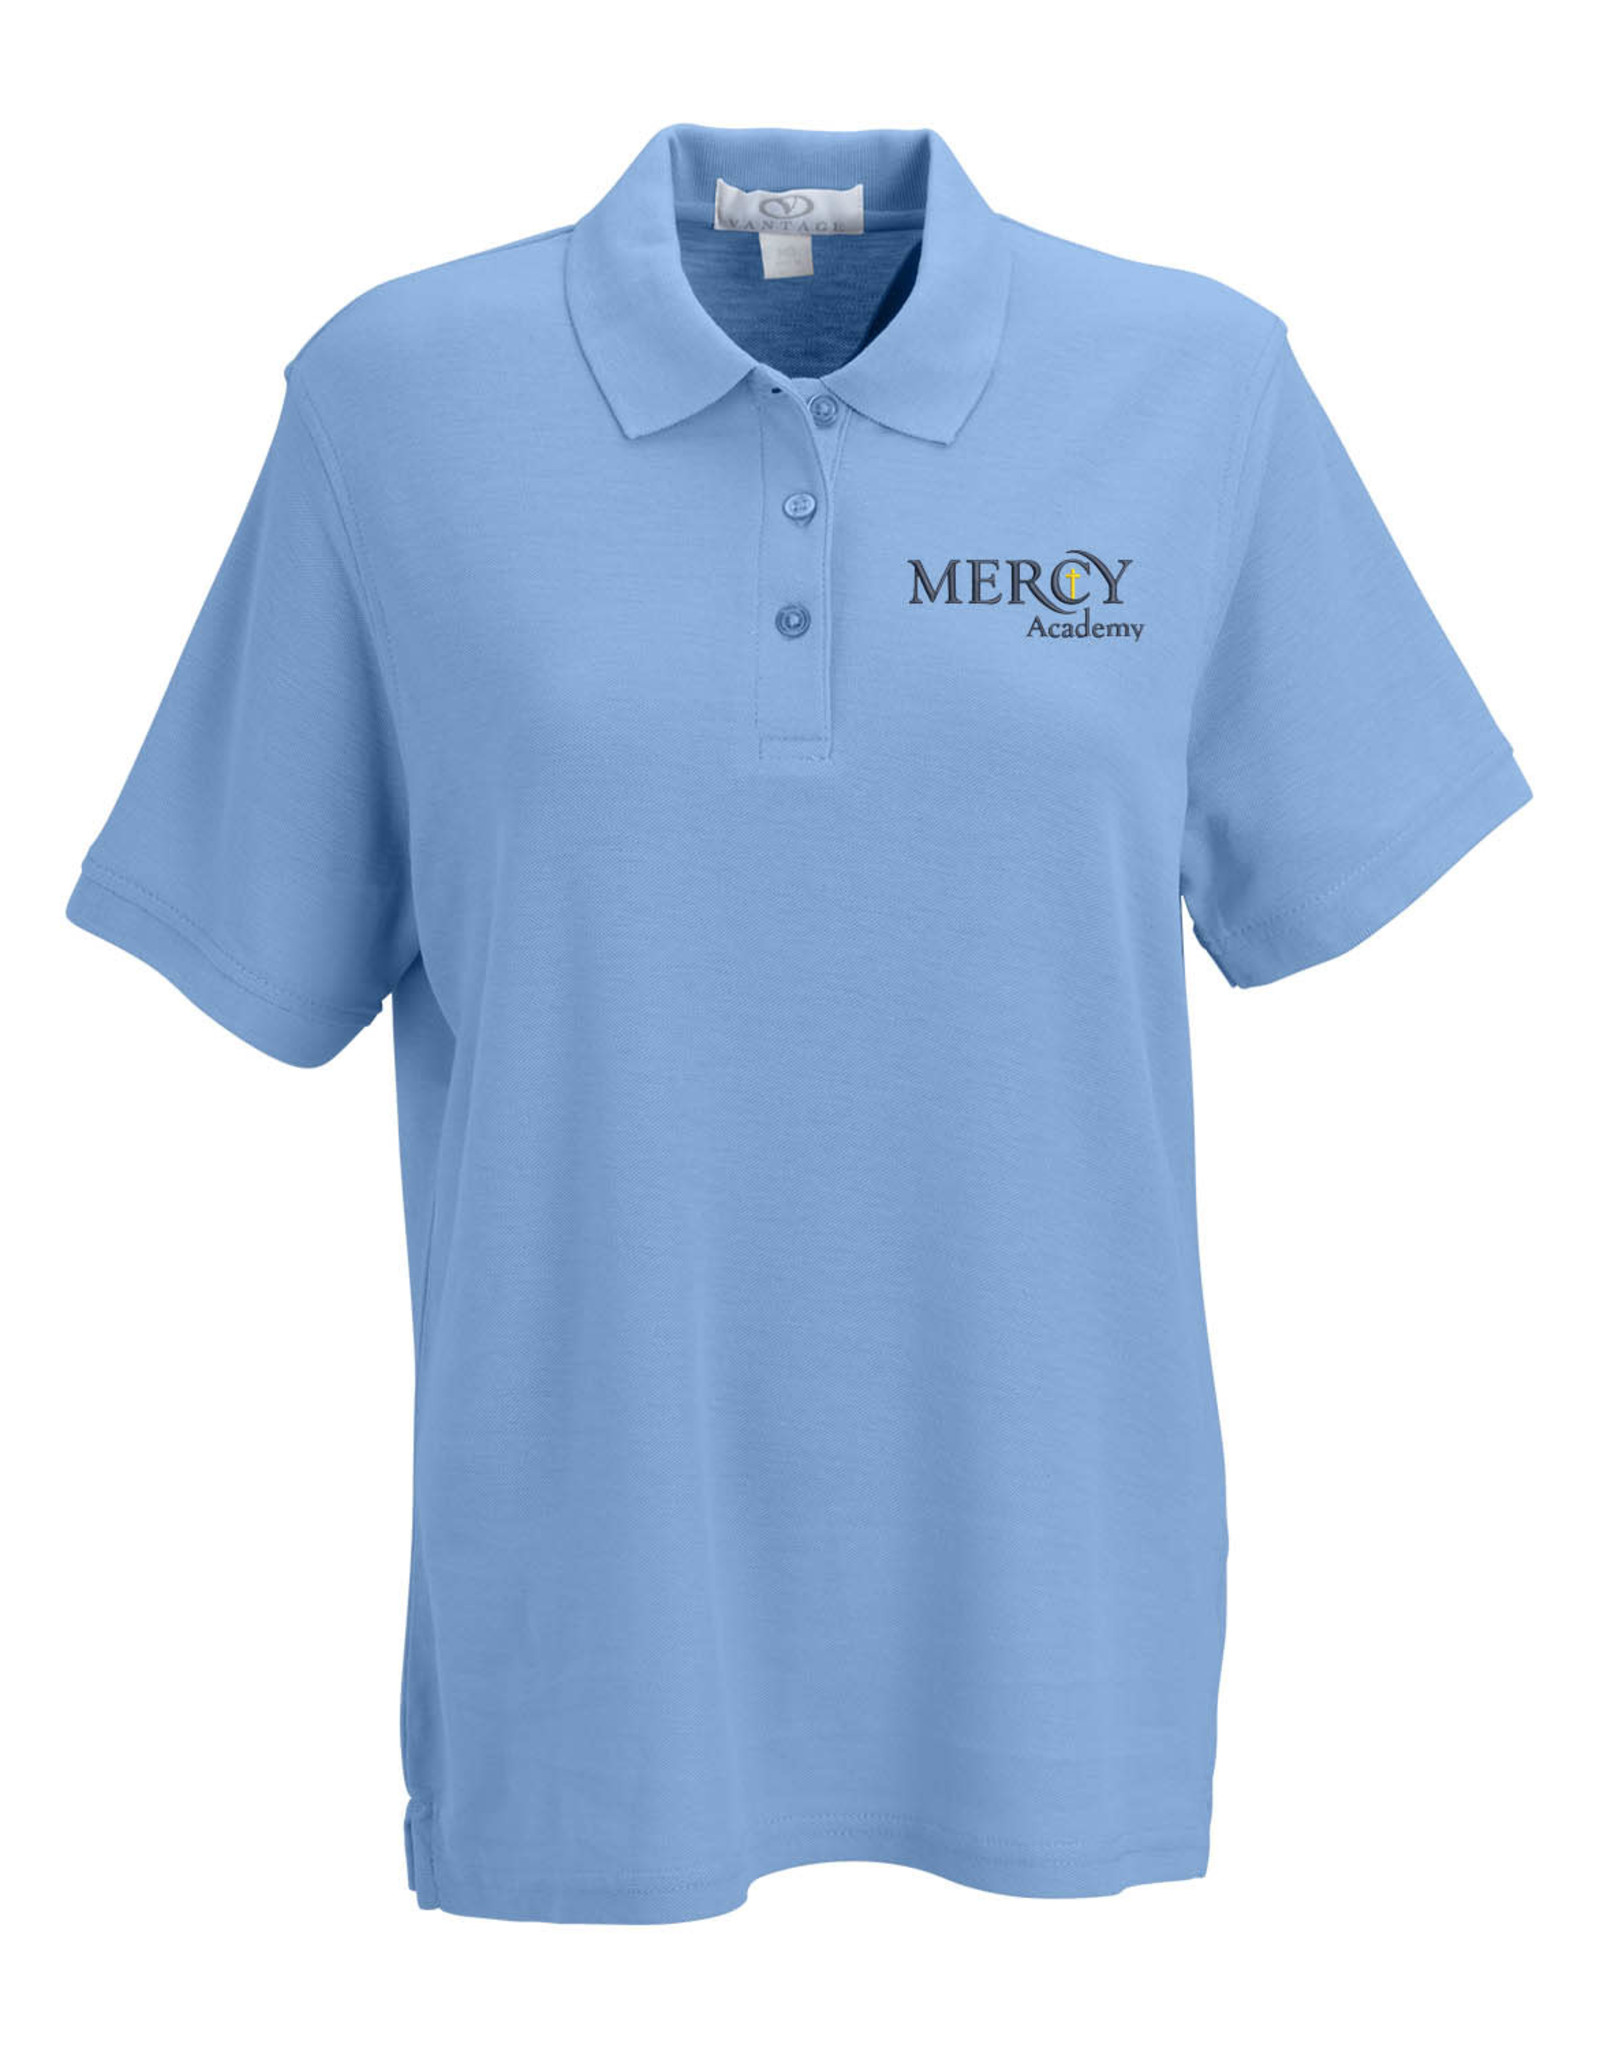 VANTAGE Uniform Polo Short Sleeve - Blue